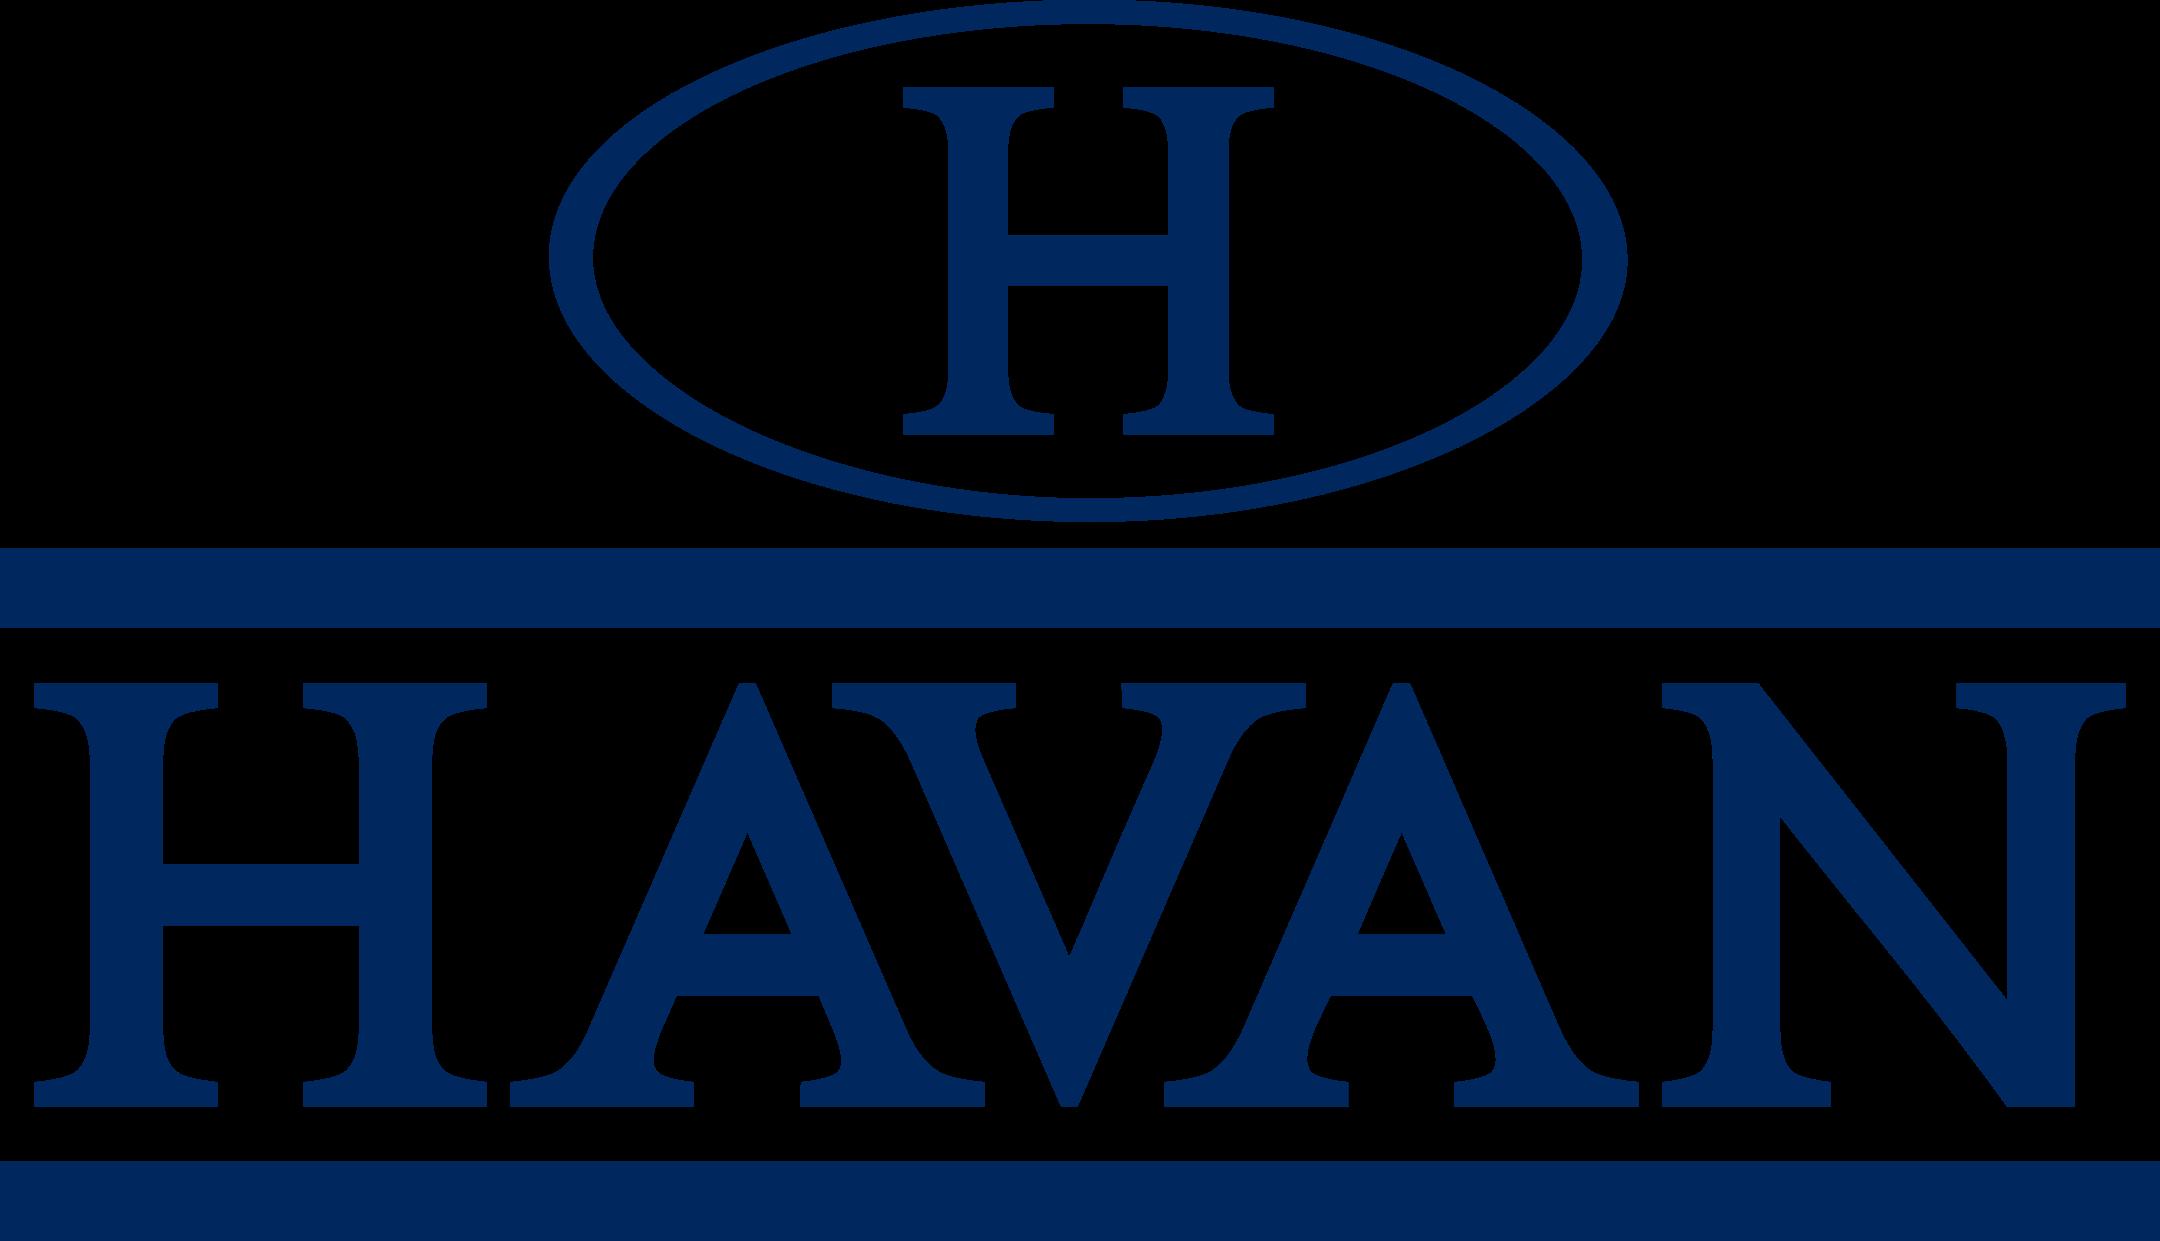 havan logo 2 1 - Havan Logo